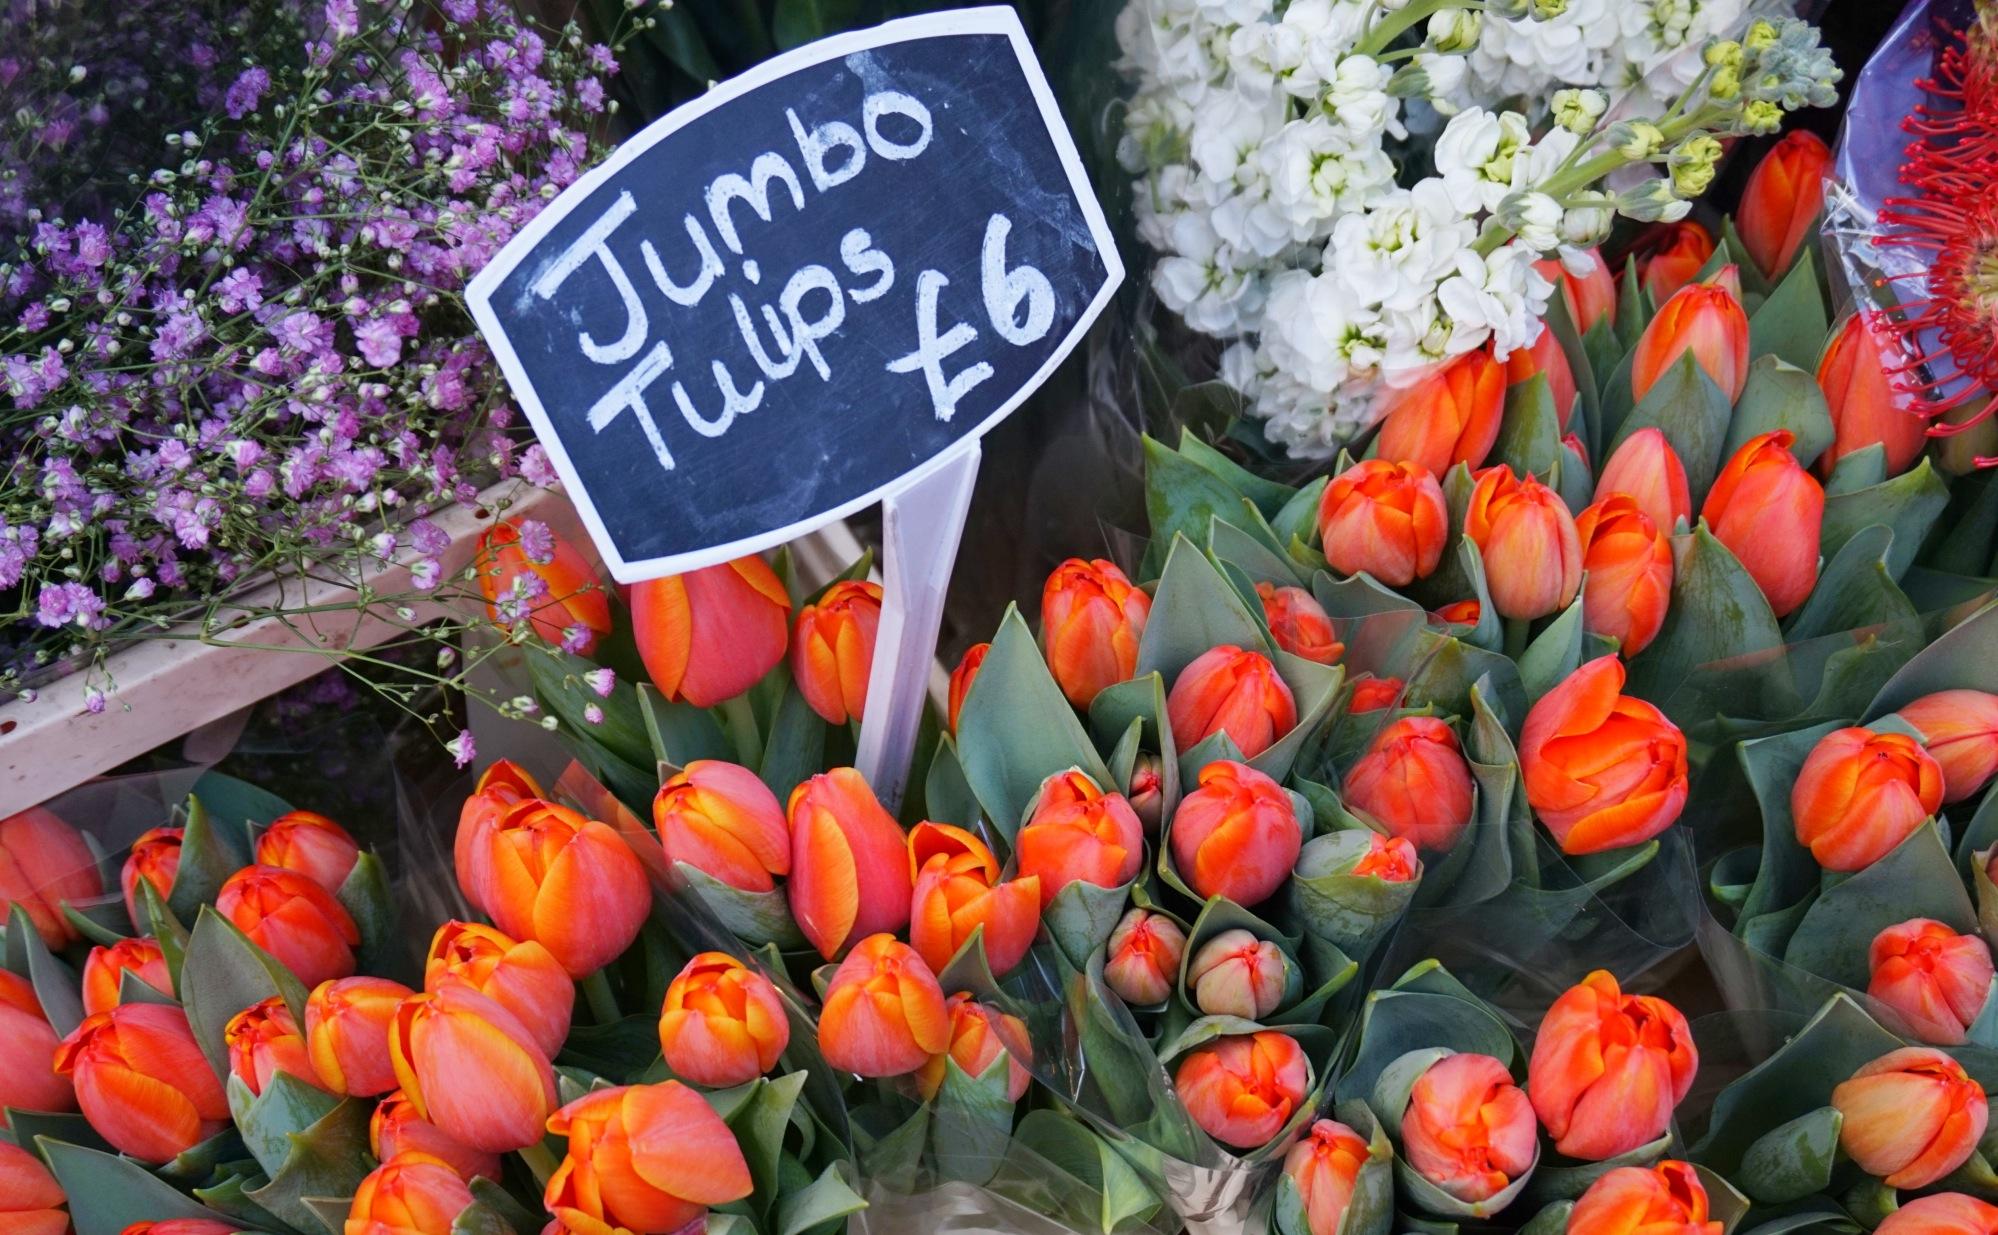 Balade-Columbia-Road-Flower-Market-9